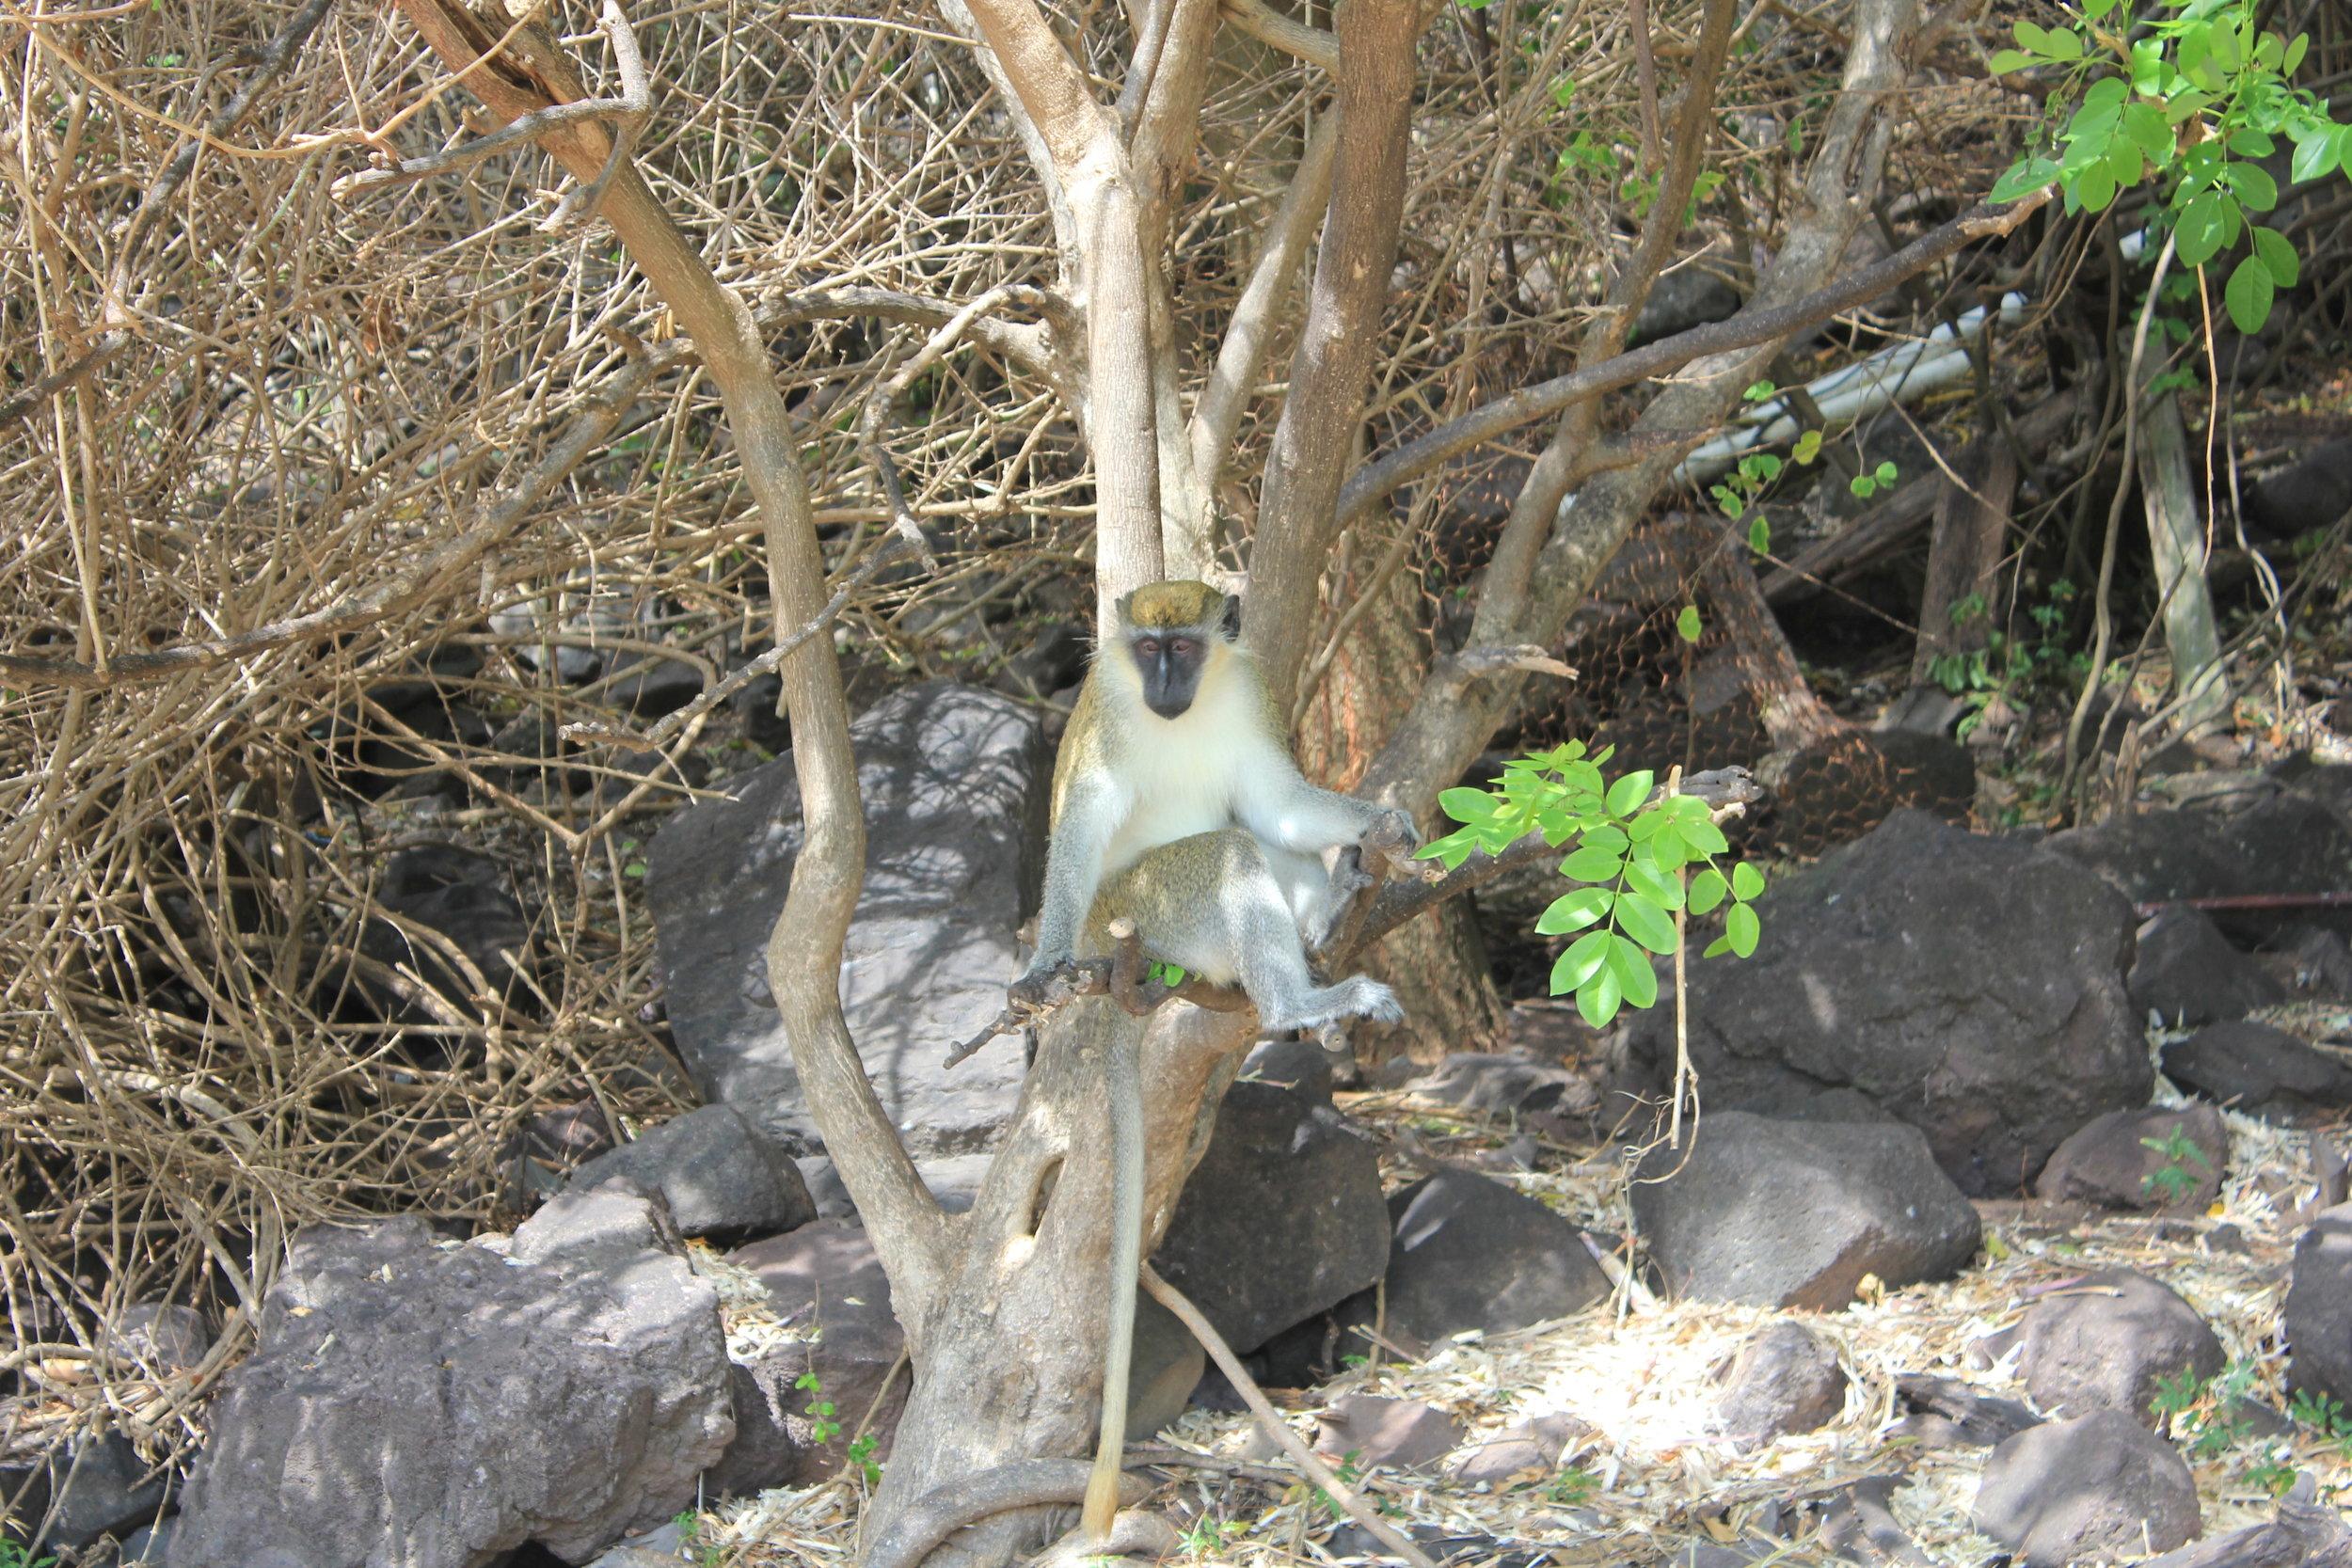 South Friar's Bay – Mischievous monkeys